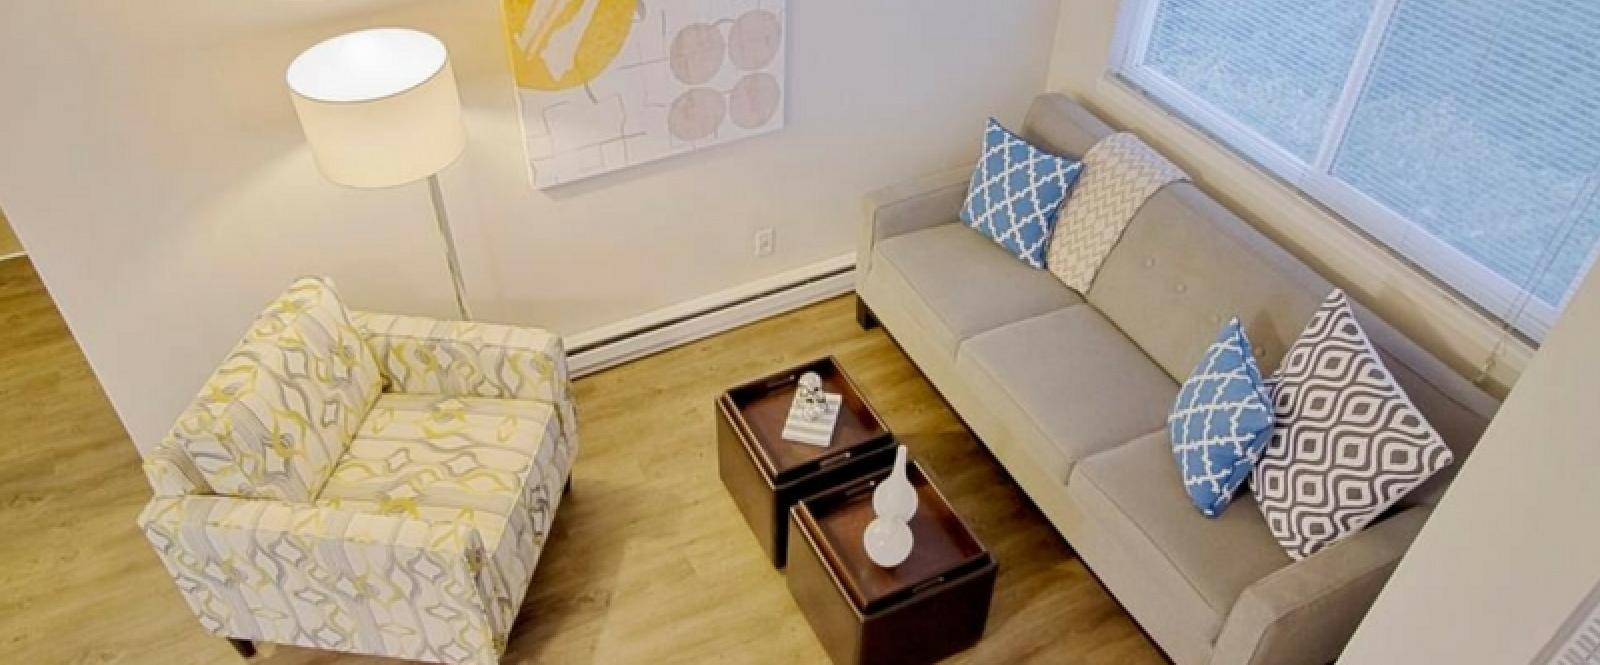 U-District-Student-Housing-Apex-Apartments-Seattle-WA-LivingRoom-Unilodgers